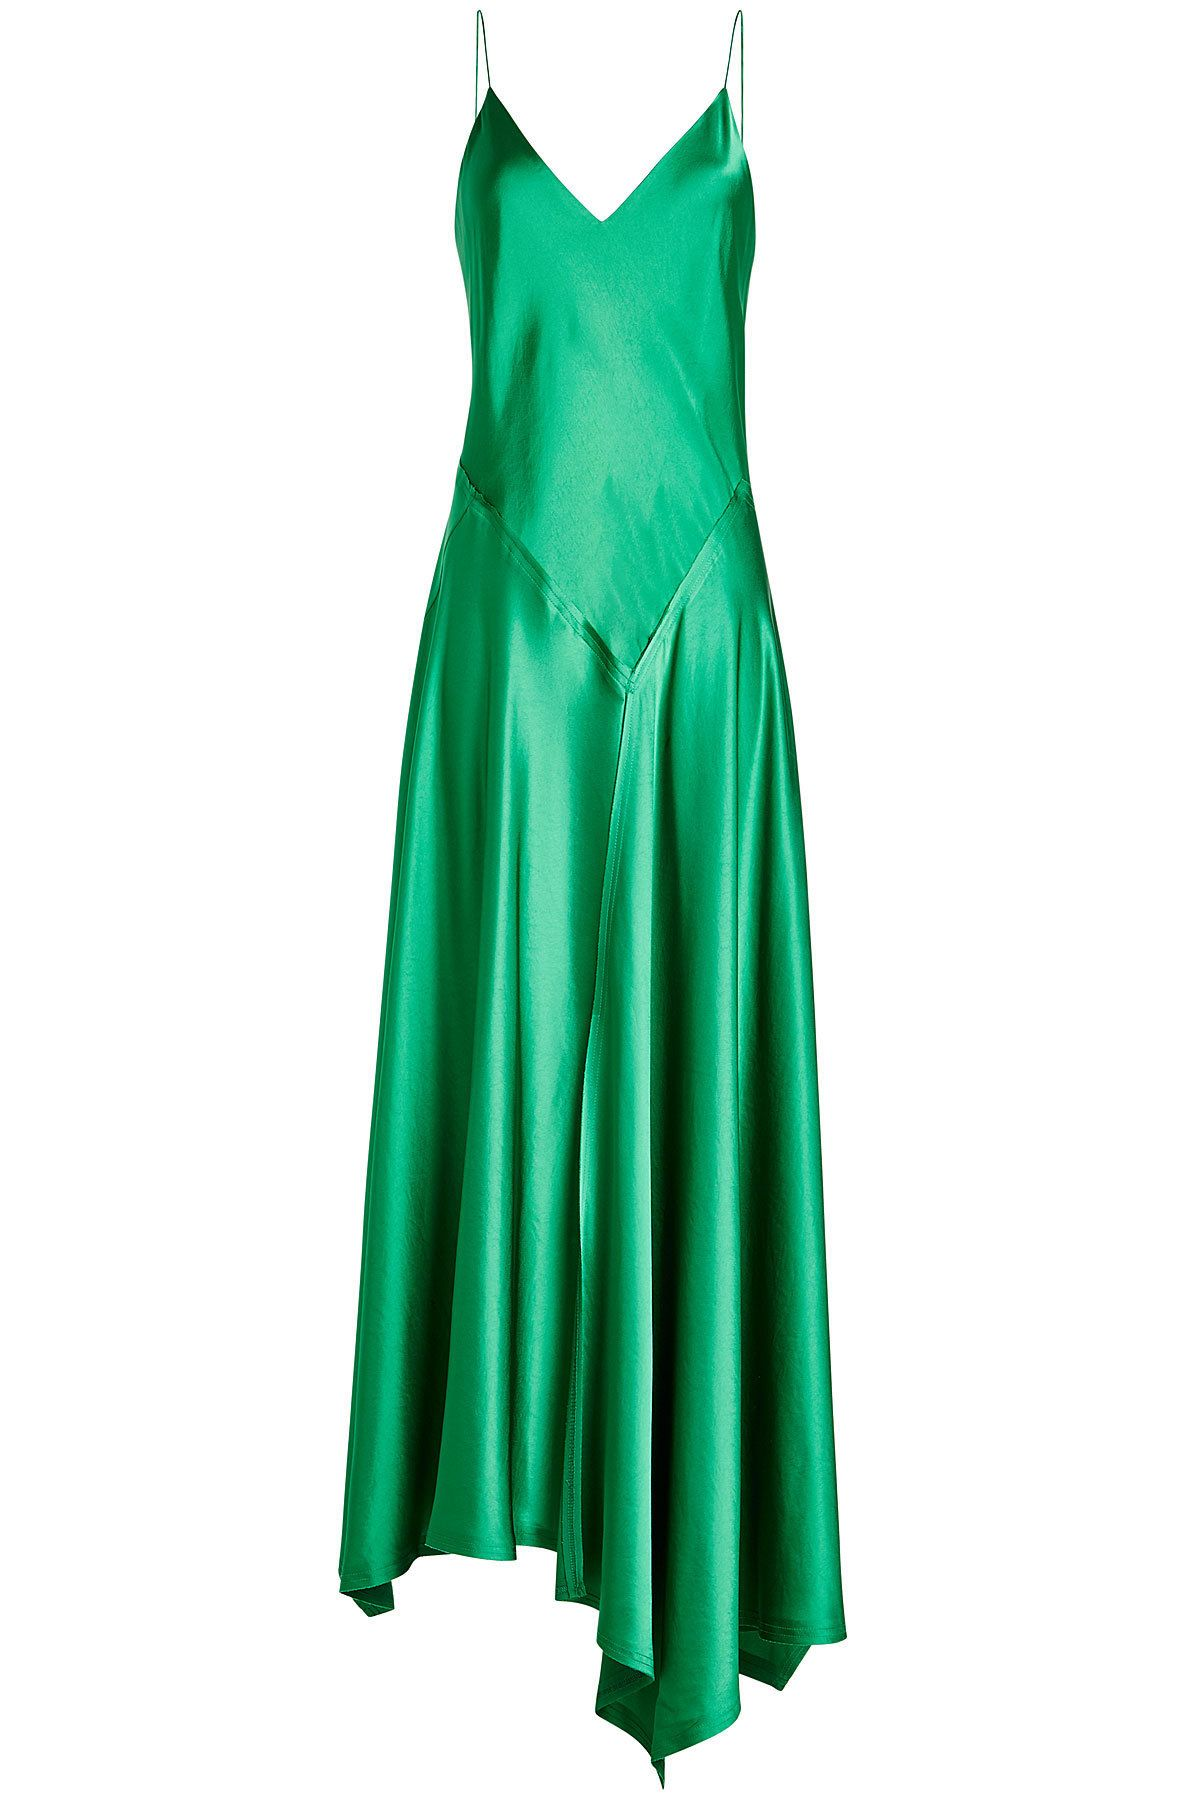 521f9faaa57 DKNY - Satin Dress with Asymmetric Hemline